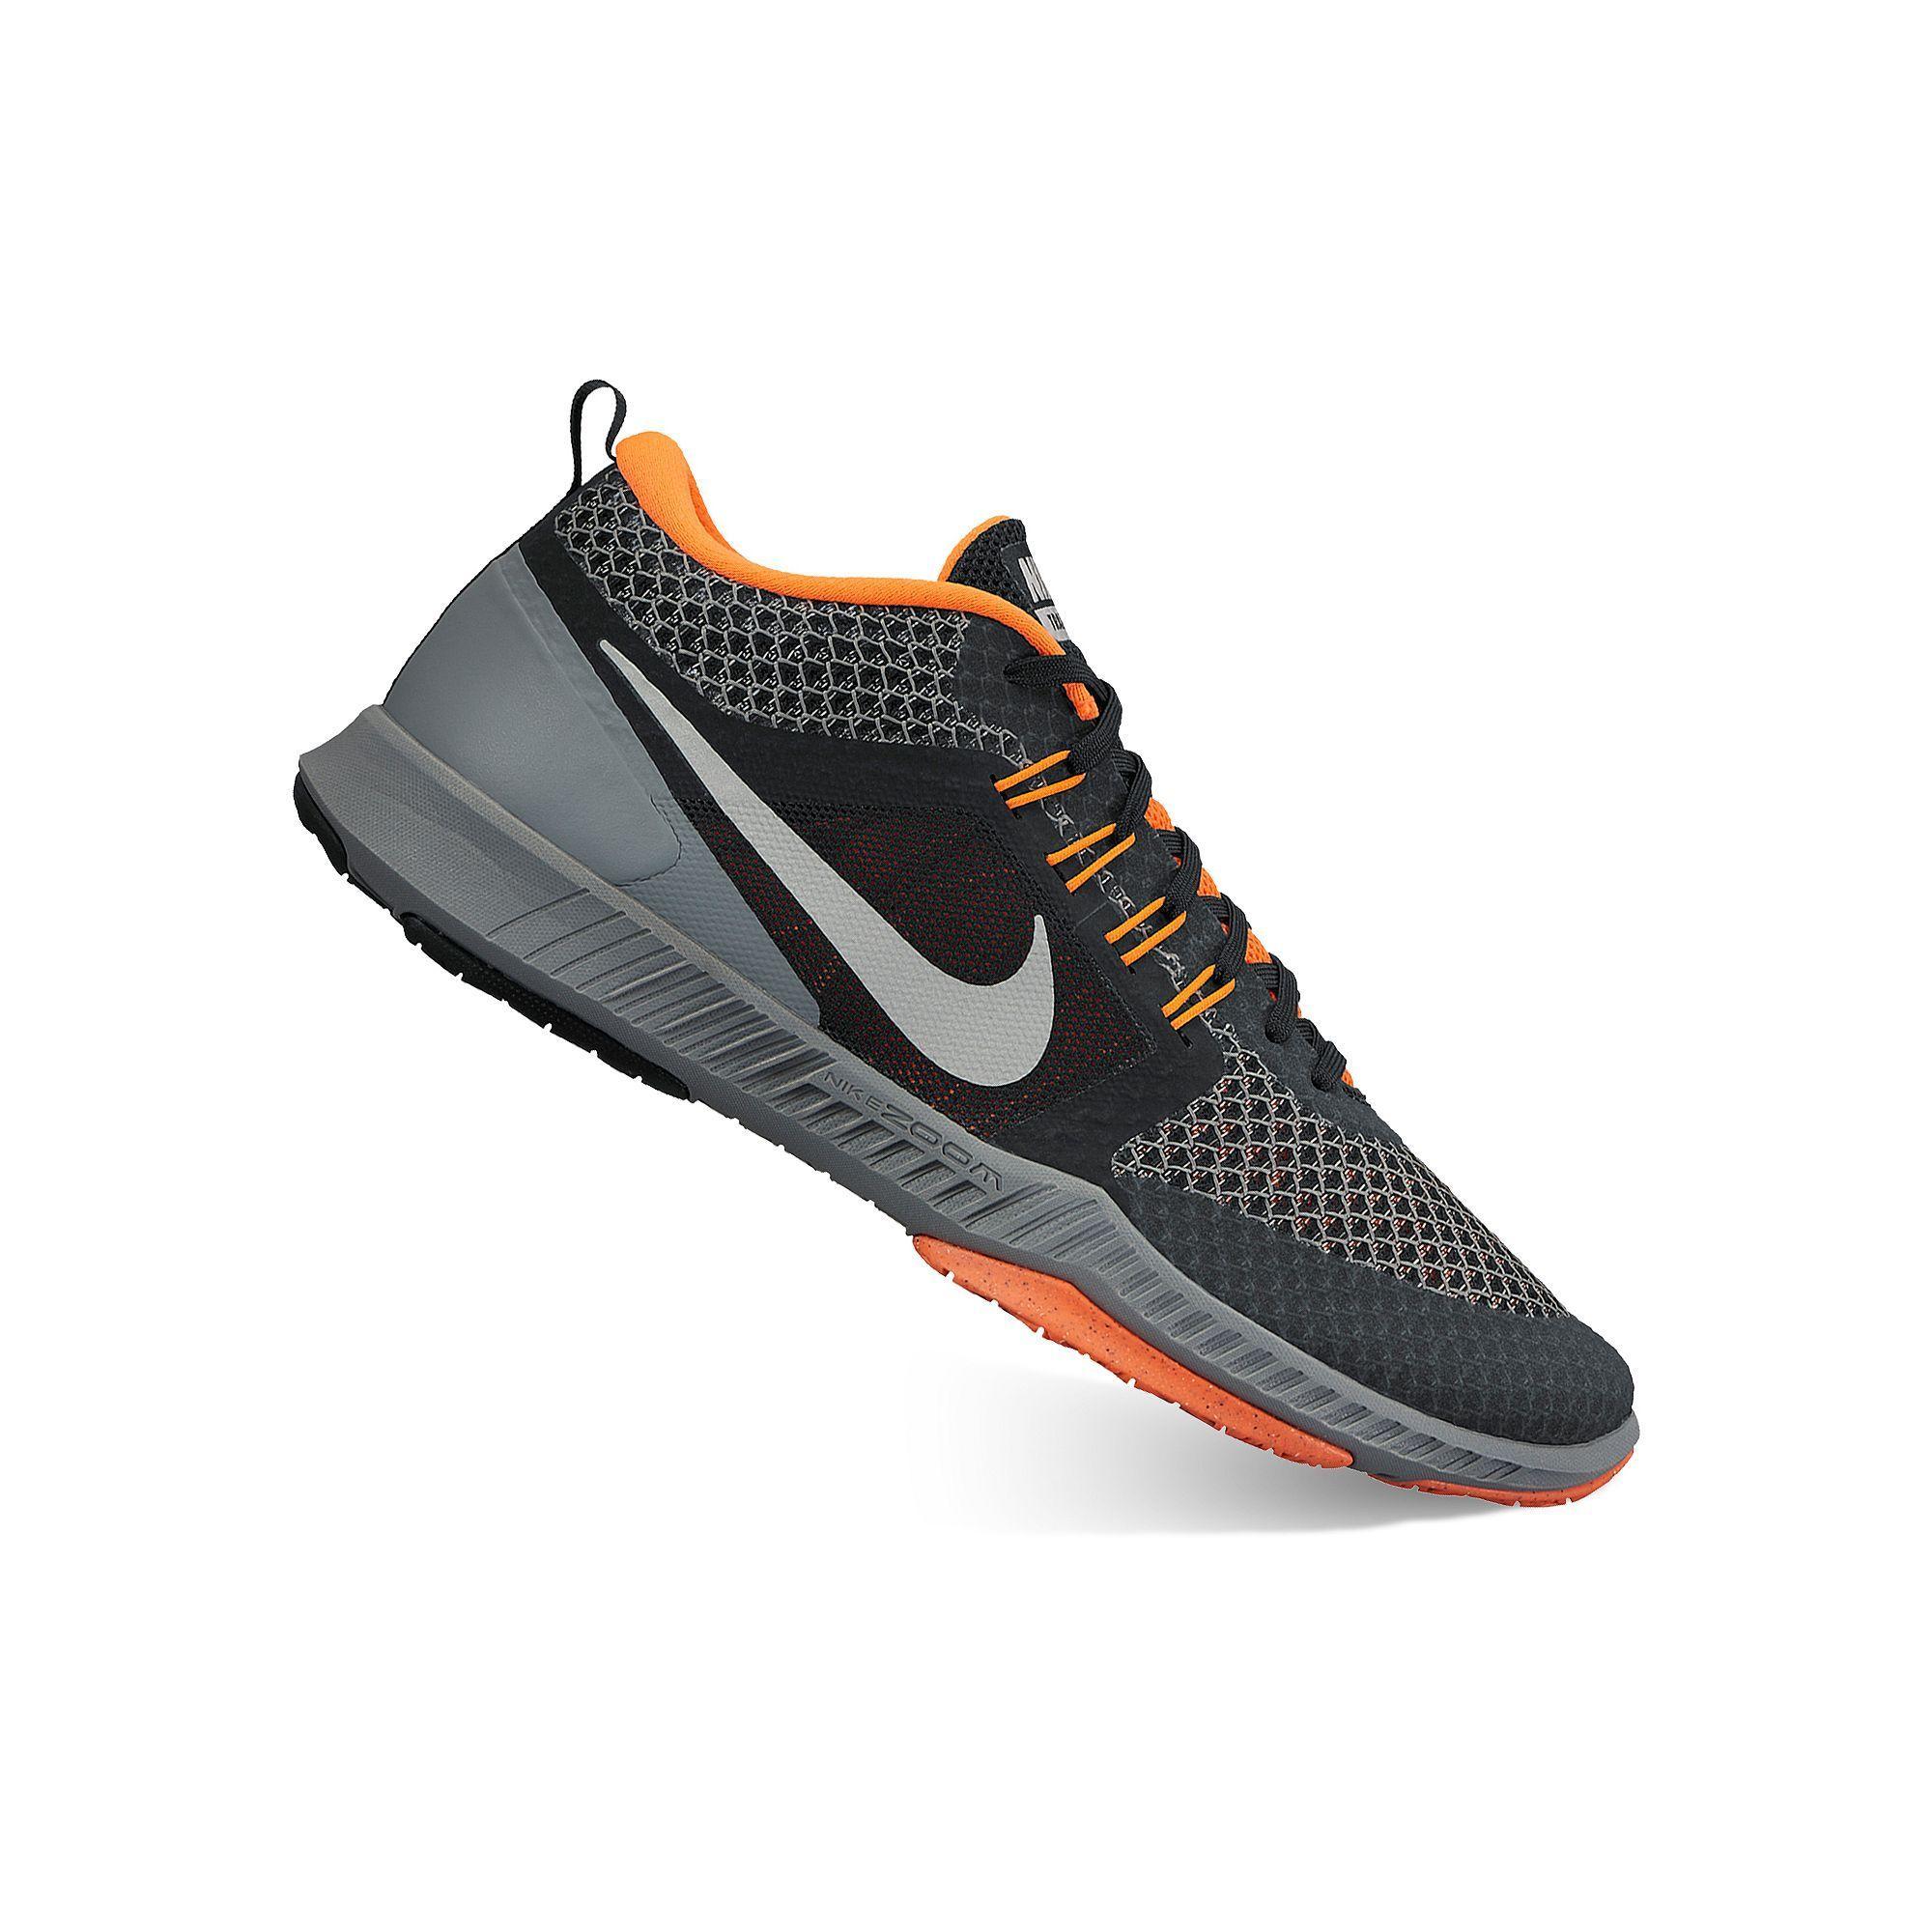 Nike Zoom Domination TR Men's Cross Training Shoes | Cross